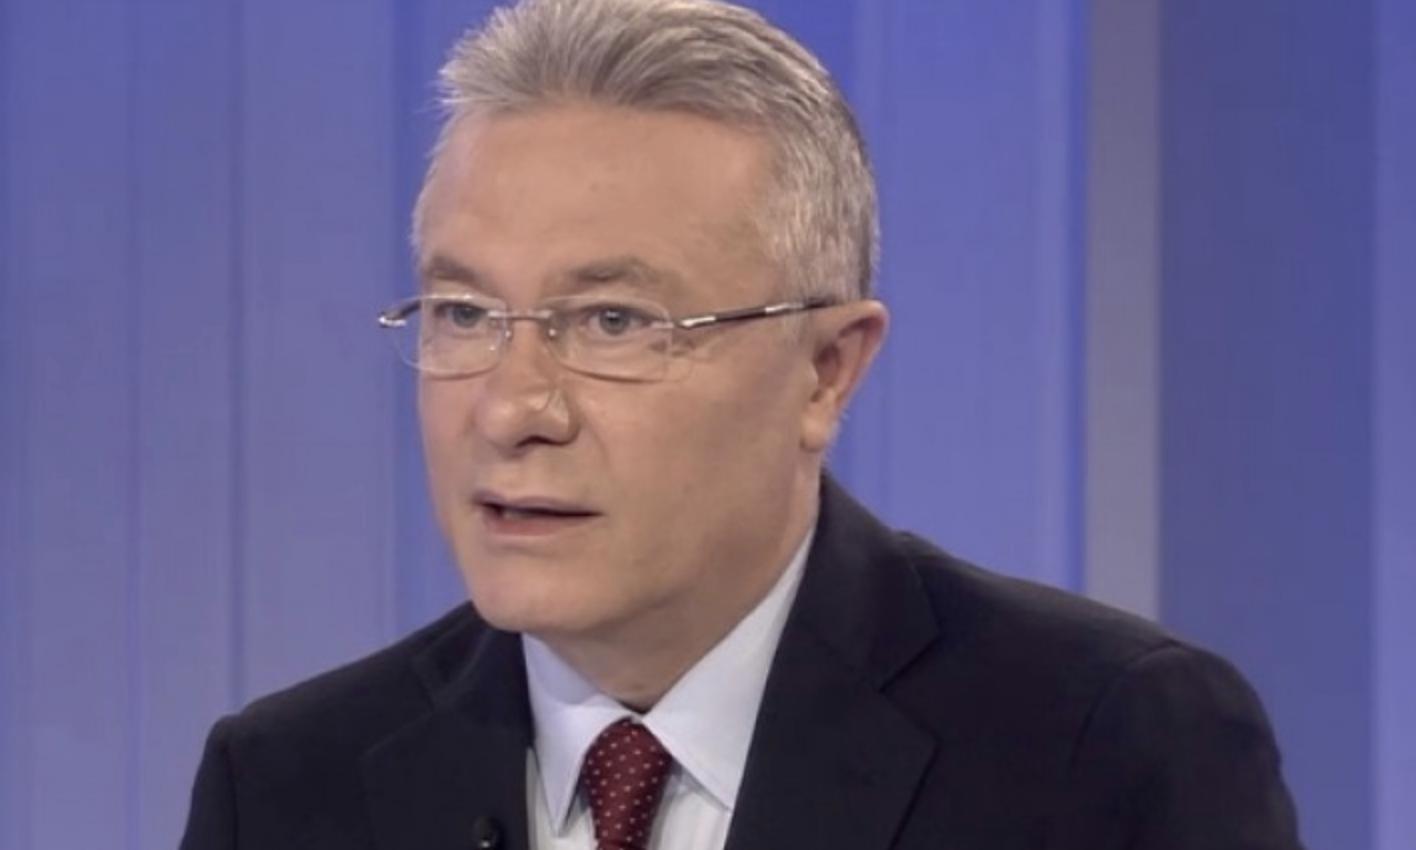 Diaconescu: Αξιοσημείωτο μισοάνοιγμα οι δηλώσεις Putin για τις σχέσεις Ρουμανίας Ρωσίας